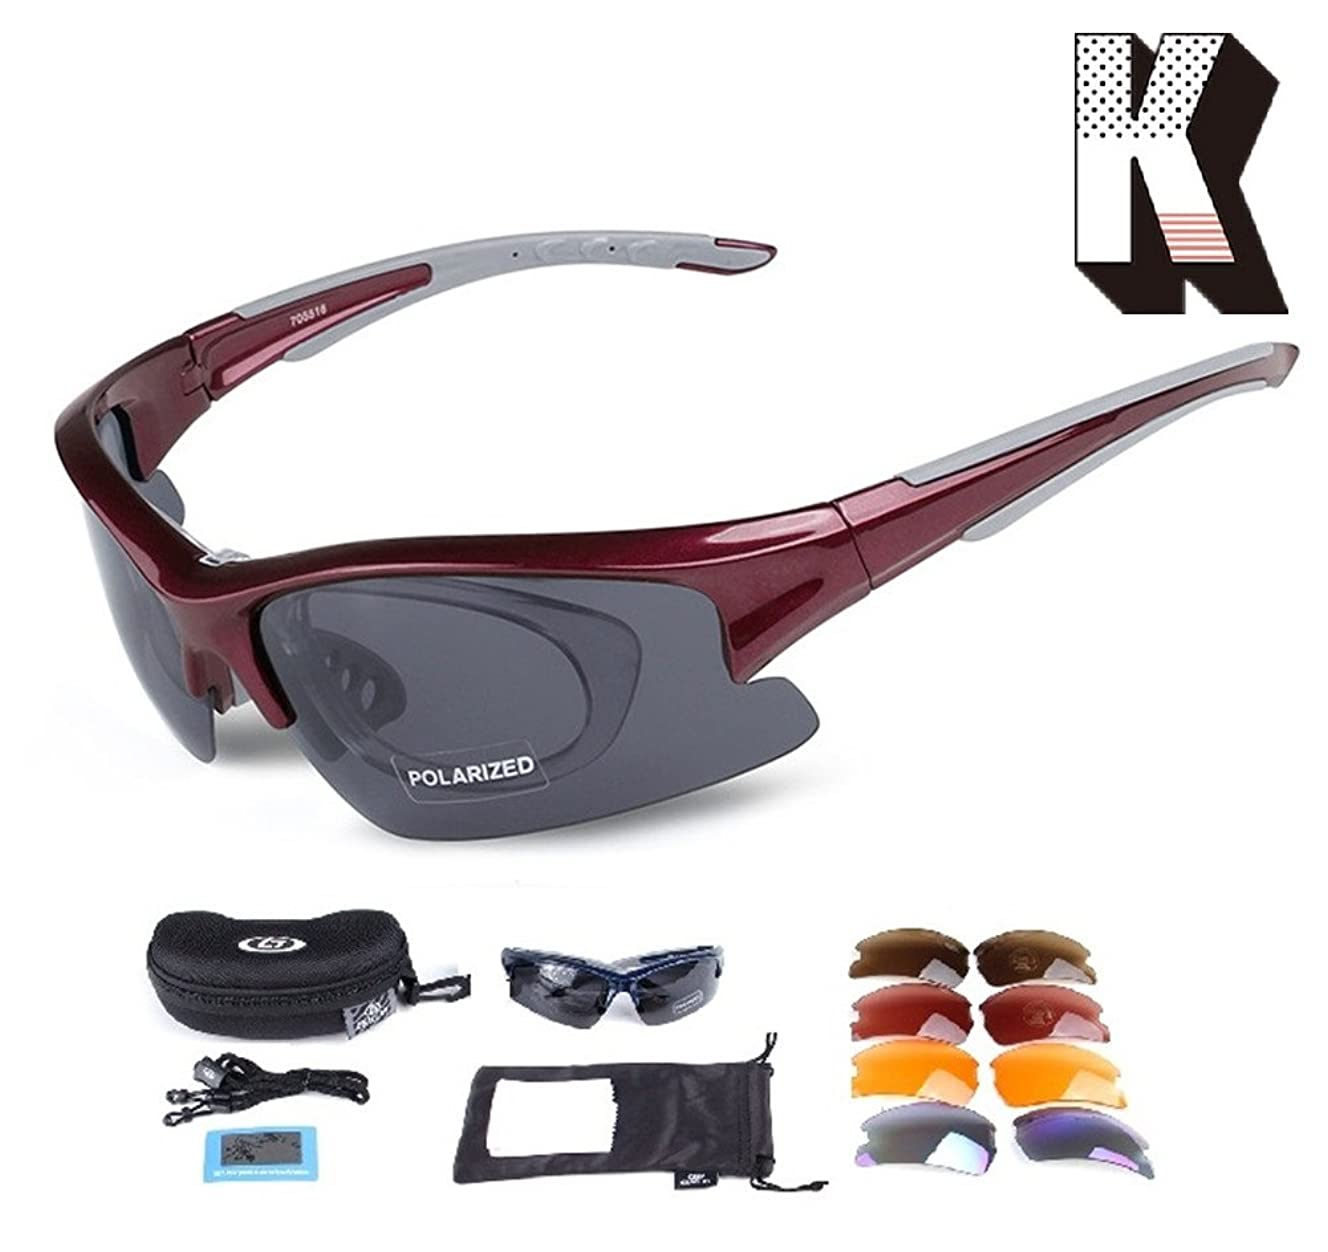 Kagogo Polarized Sports Sunglasses Sun Glasses with 5 Interchangeable Lenses for Men Women Baseball Cycling Running Hiking Golf Goggles